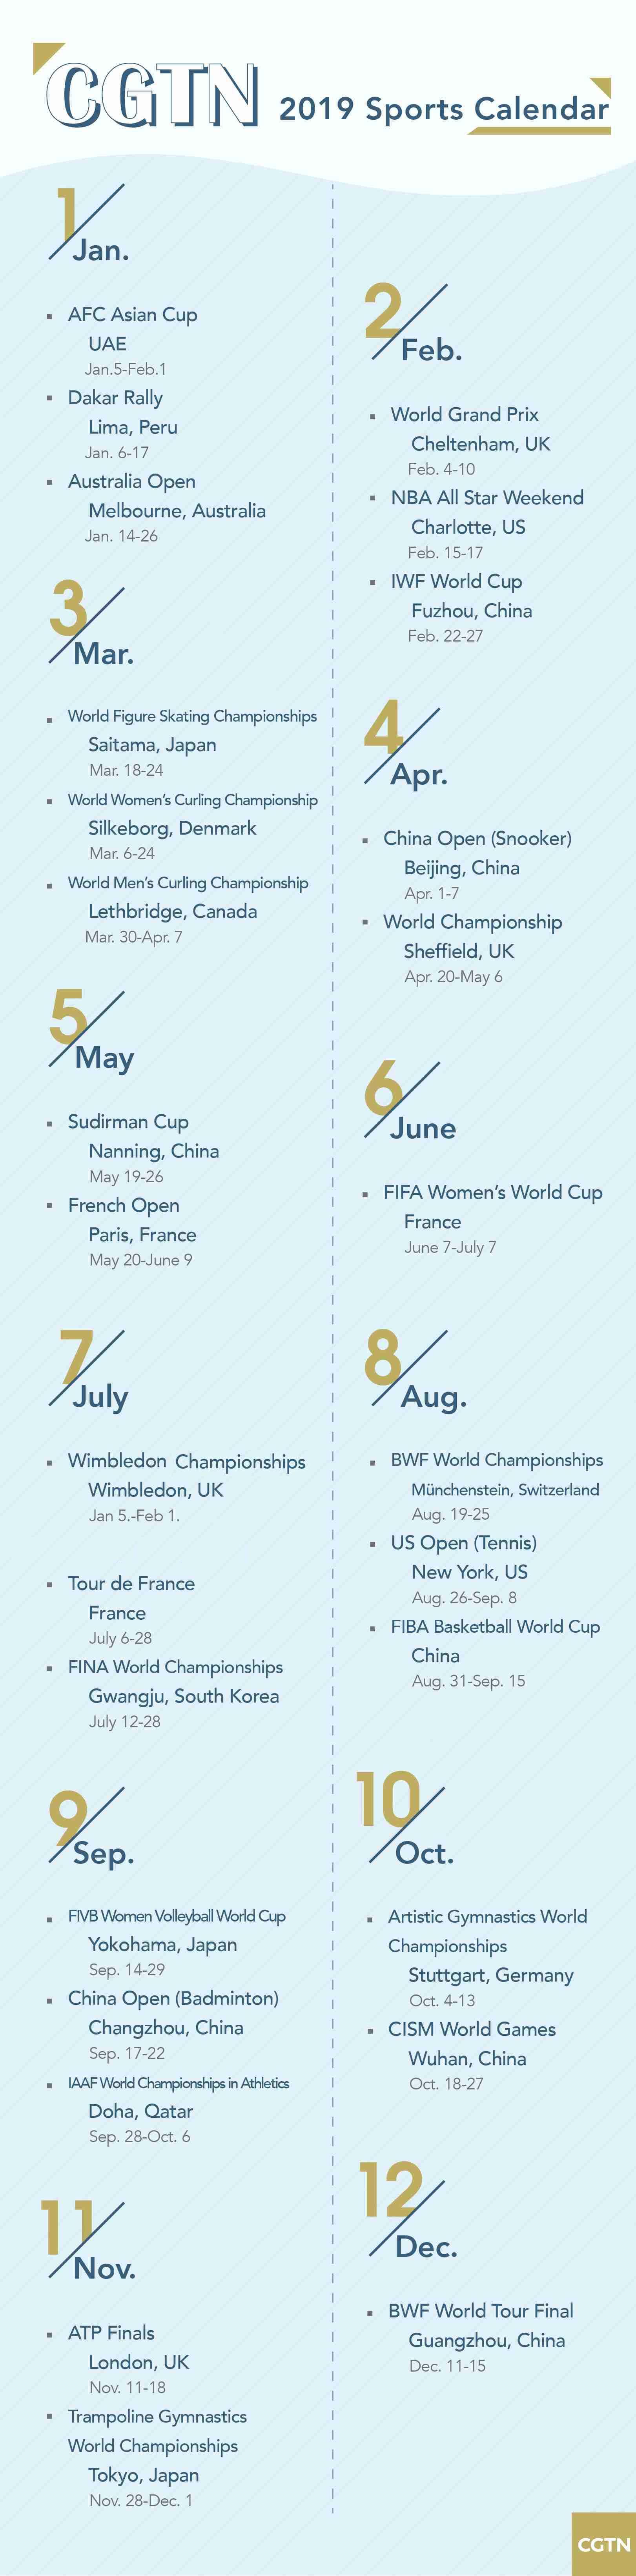 Infographic: CGTN 2019 Sports Calendar - CGTN